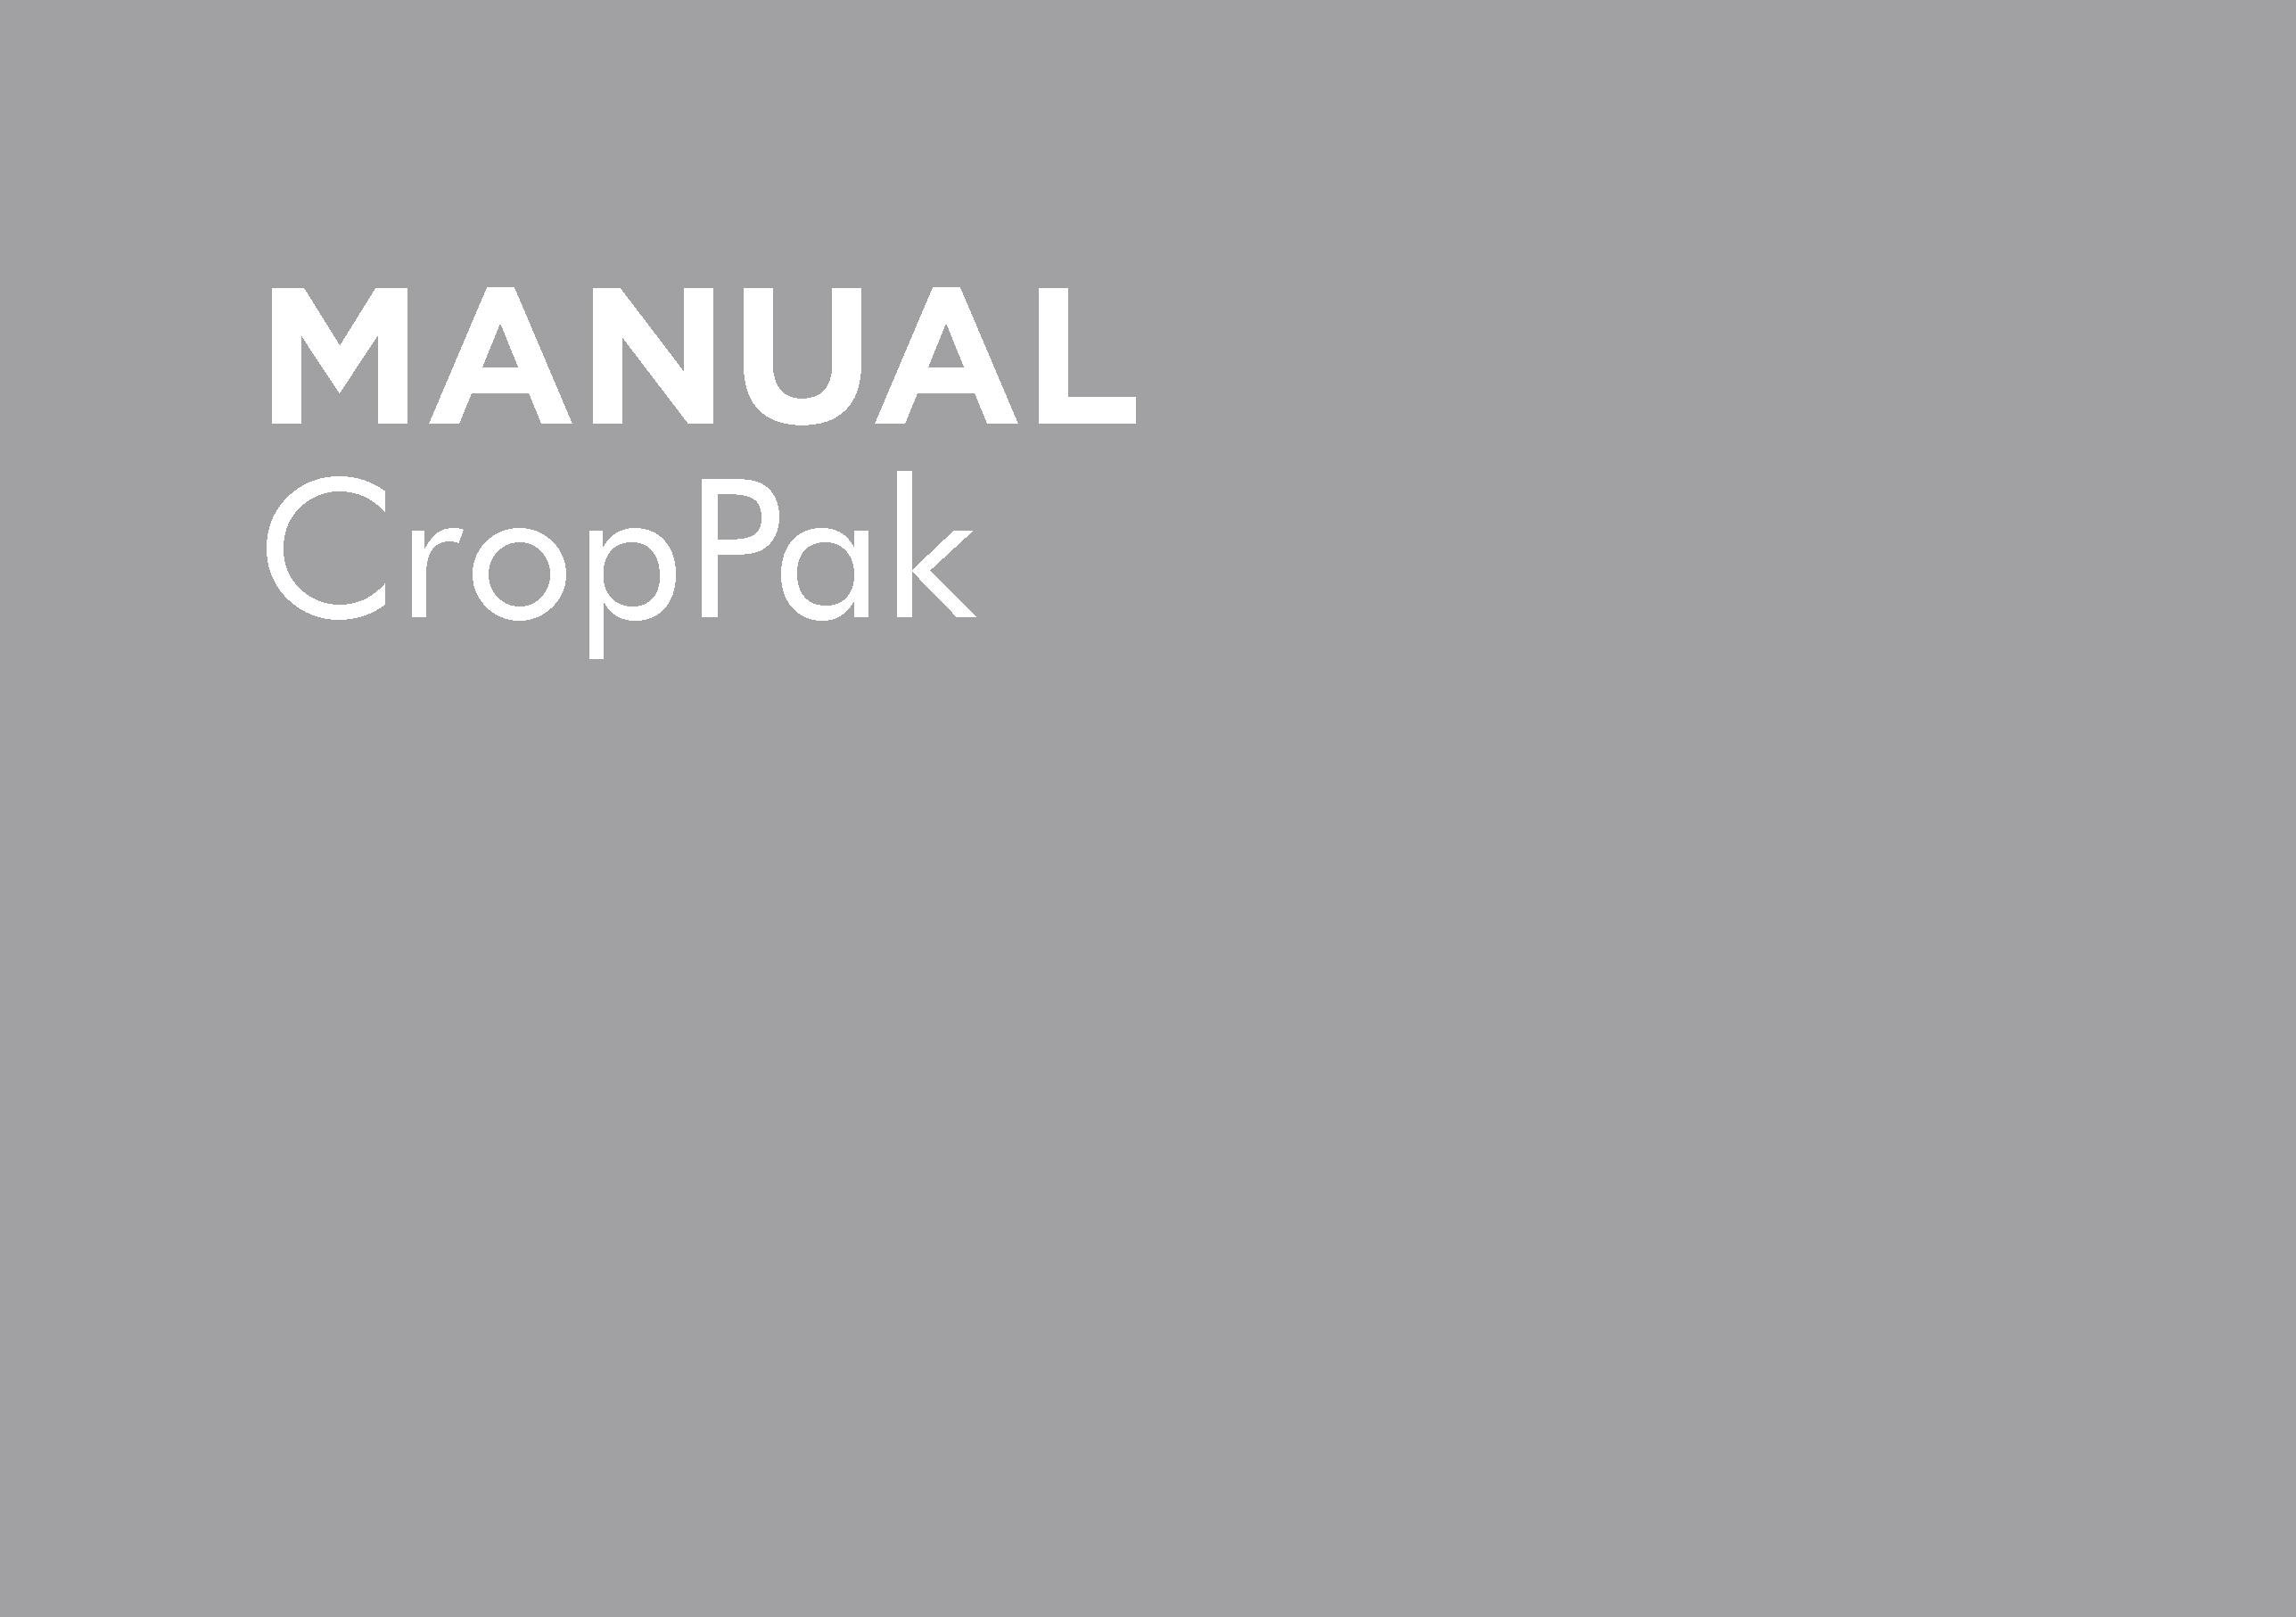 GP-OMCP12-C – CROPPAK OPERATORS MANUAL VC